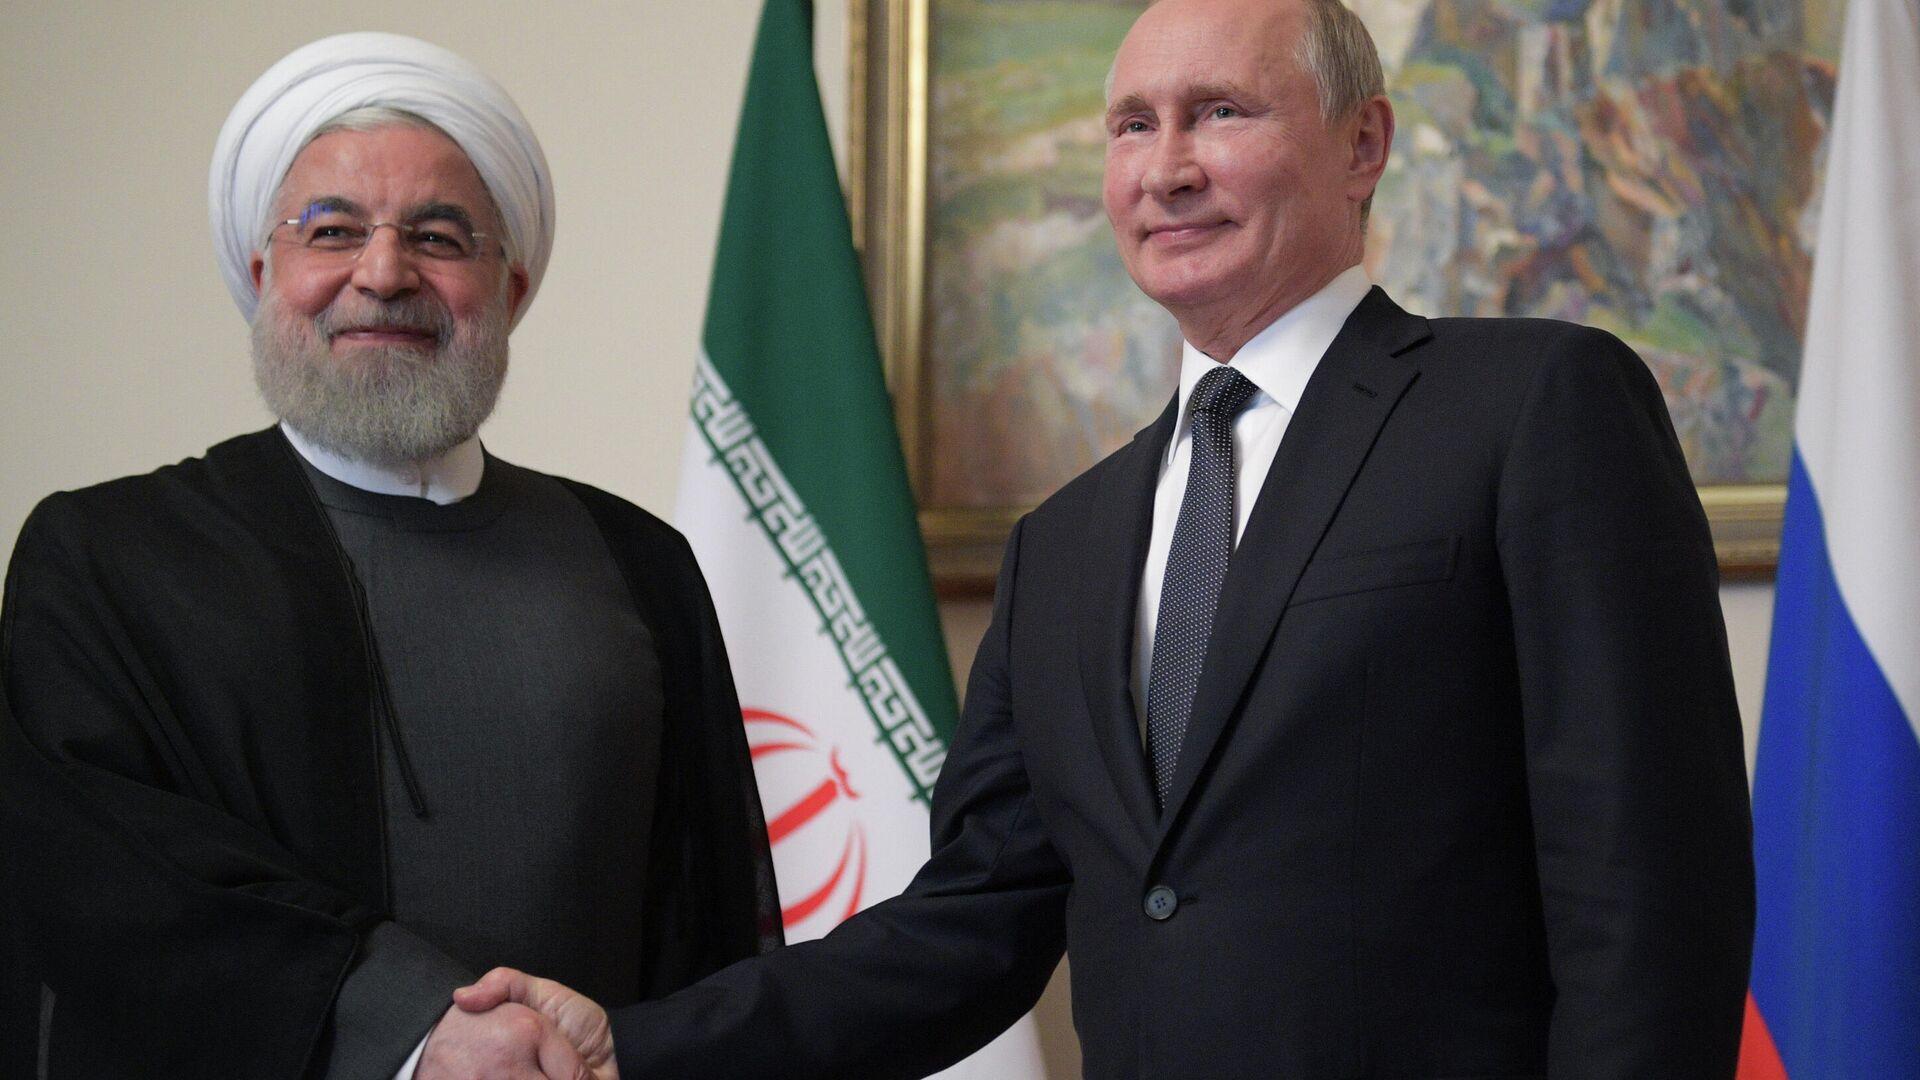 Президент РФ Владимир Путин и президент Исламской Республики Иран Хасан Роухани во время встречи в рамках саммита ЕАЭС - РИА Новости, 1920, 10.10.2020